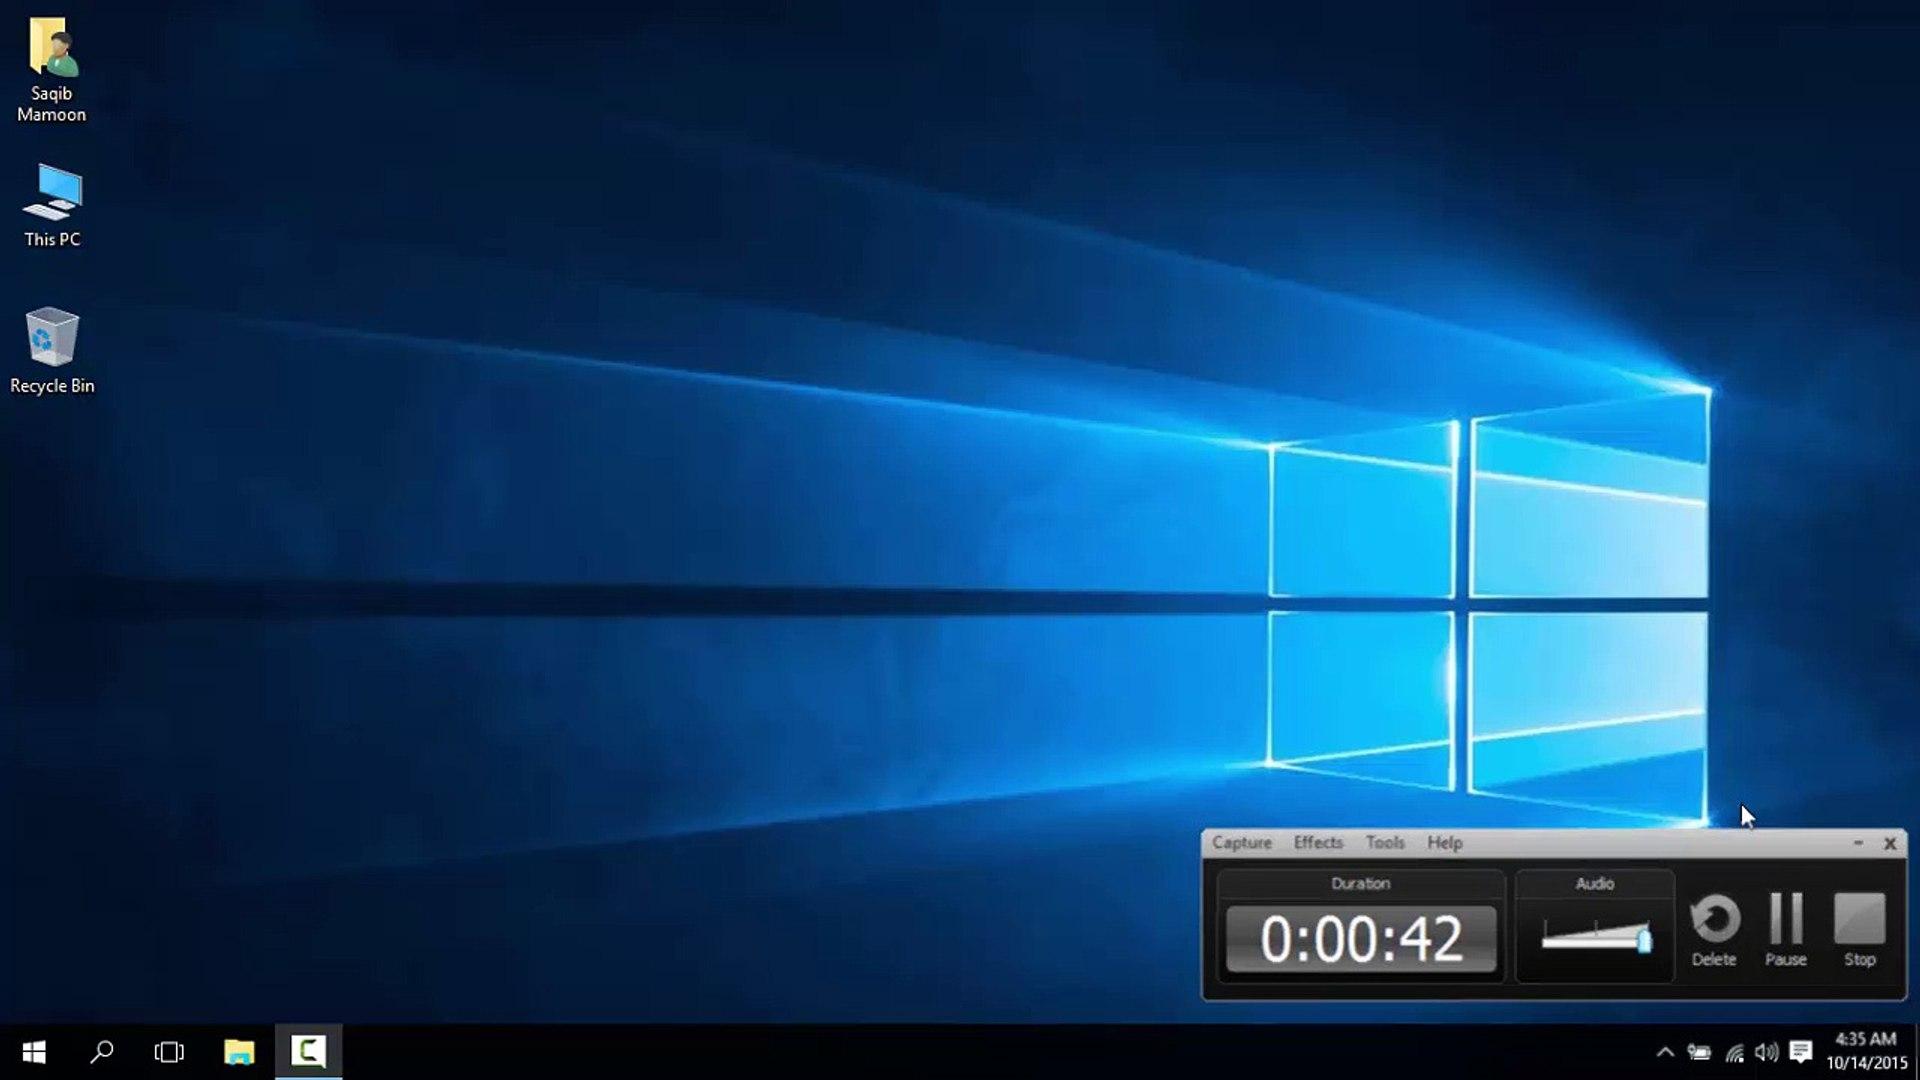 How to defer updates/Stop updates in windows 10